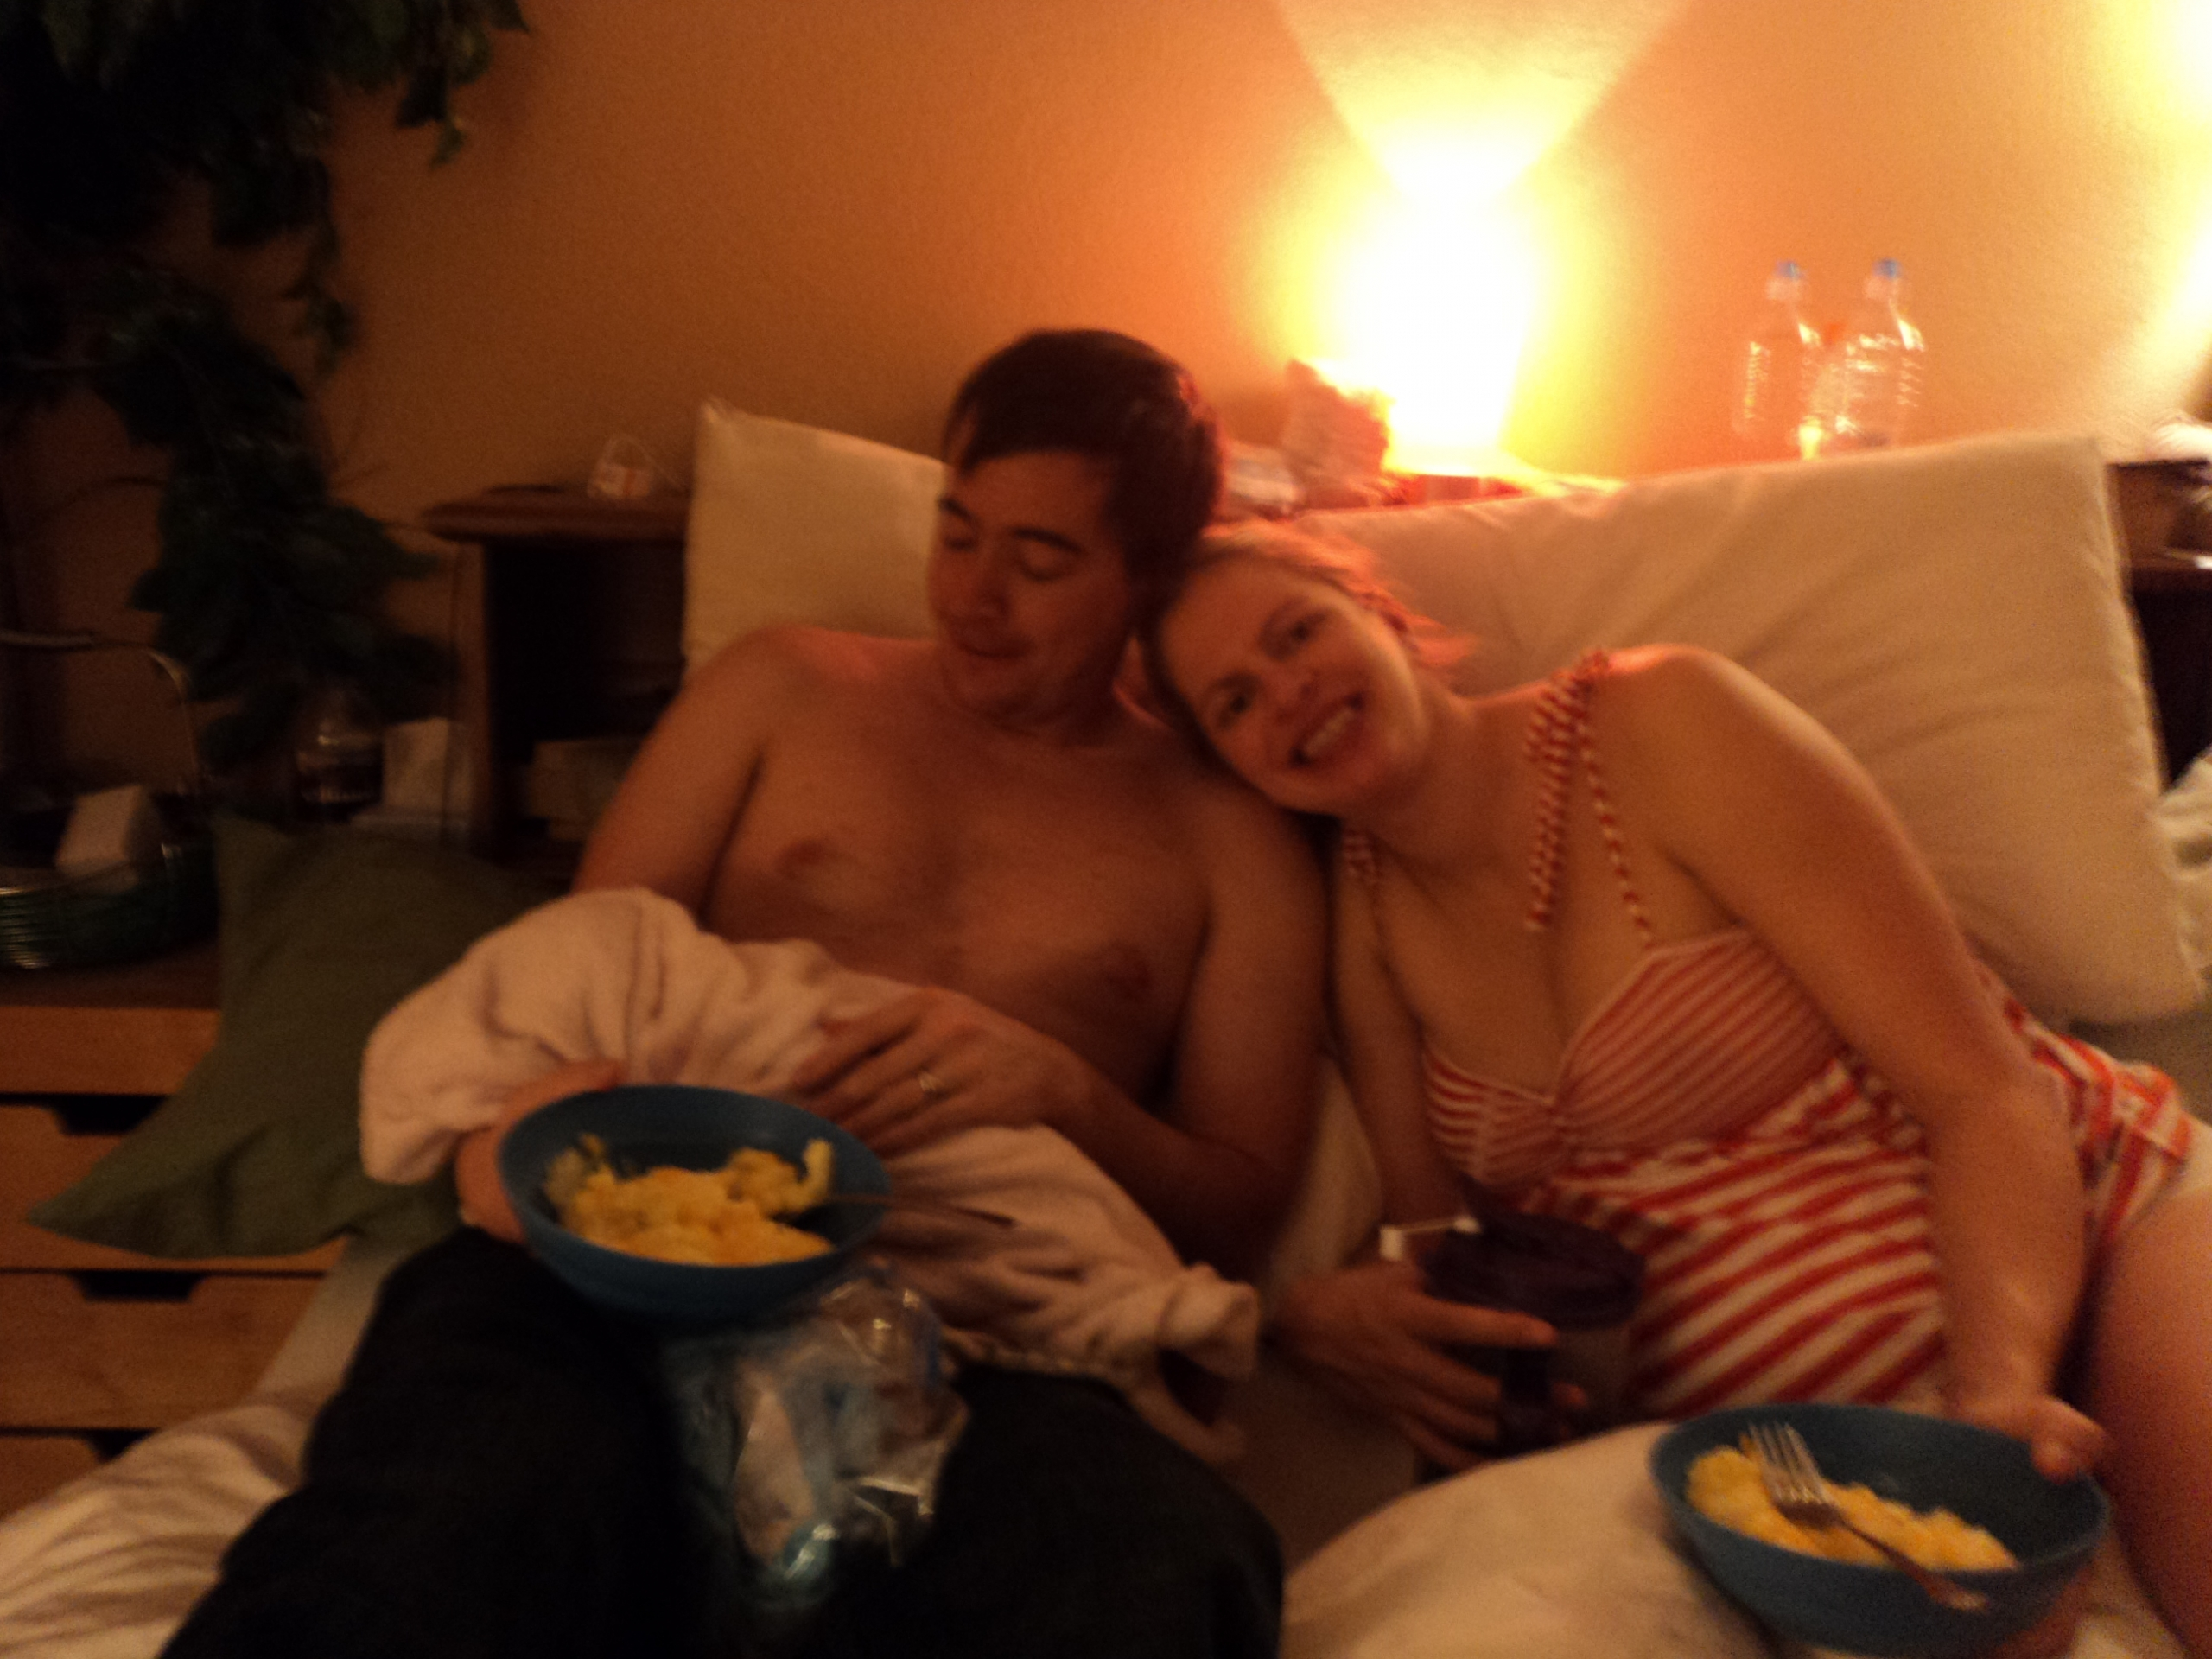 Eating Eggs in Bed